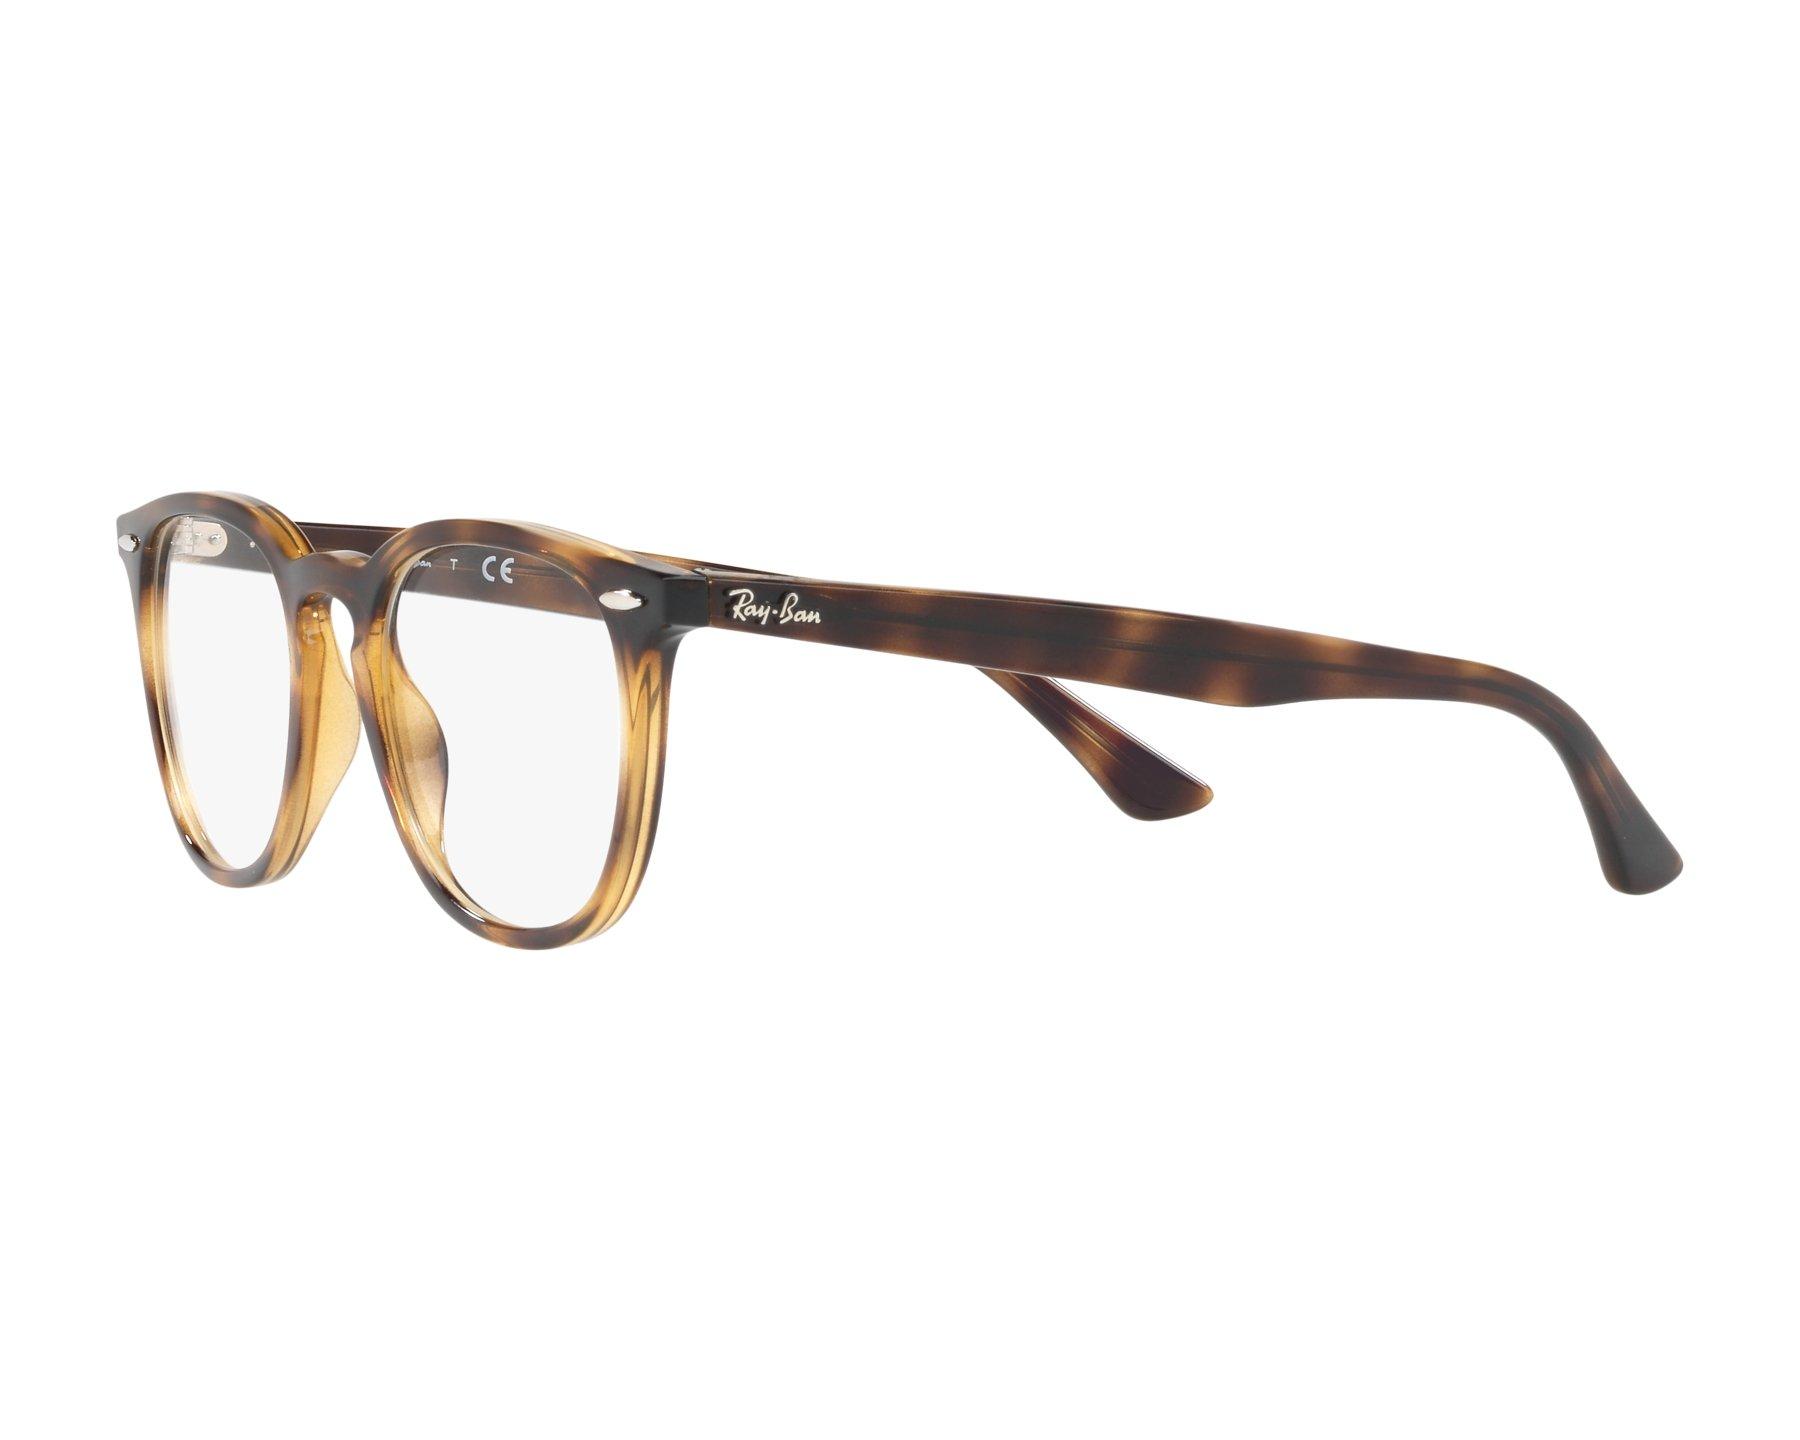 72e1e706460 eyeglasses Ray-Ban RX-7159 2012 50-20 Havana 360 degree view 3